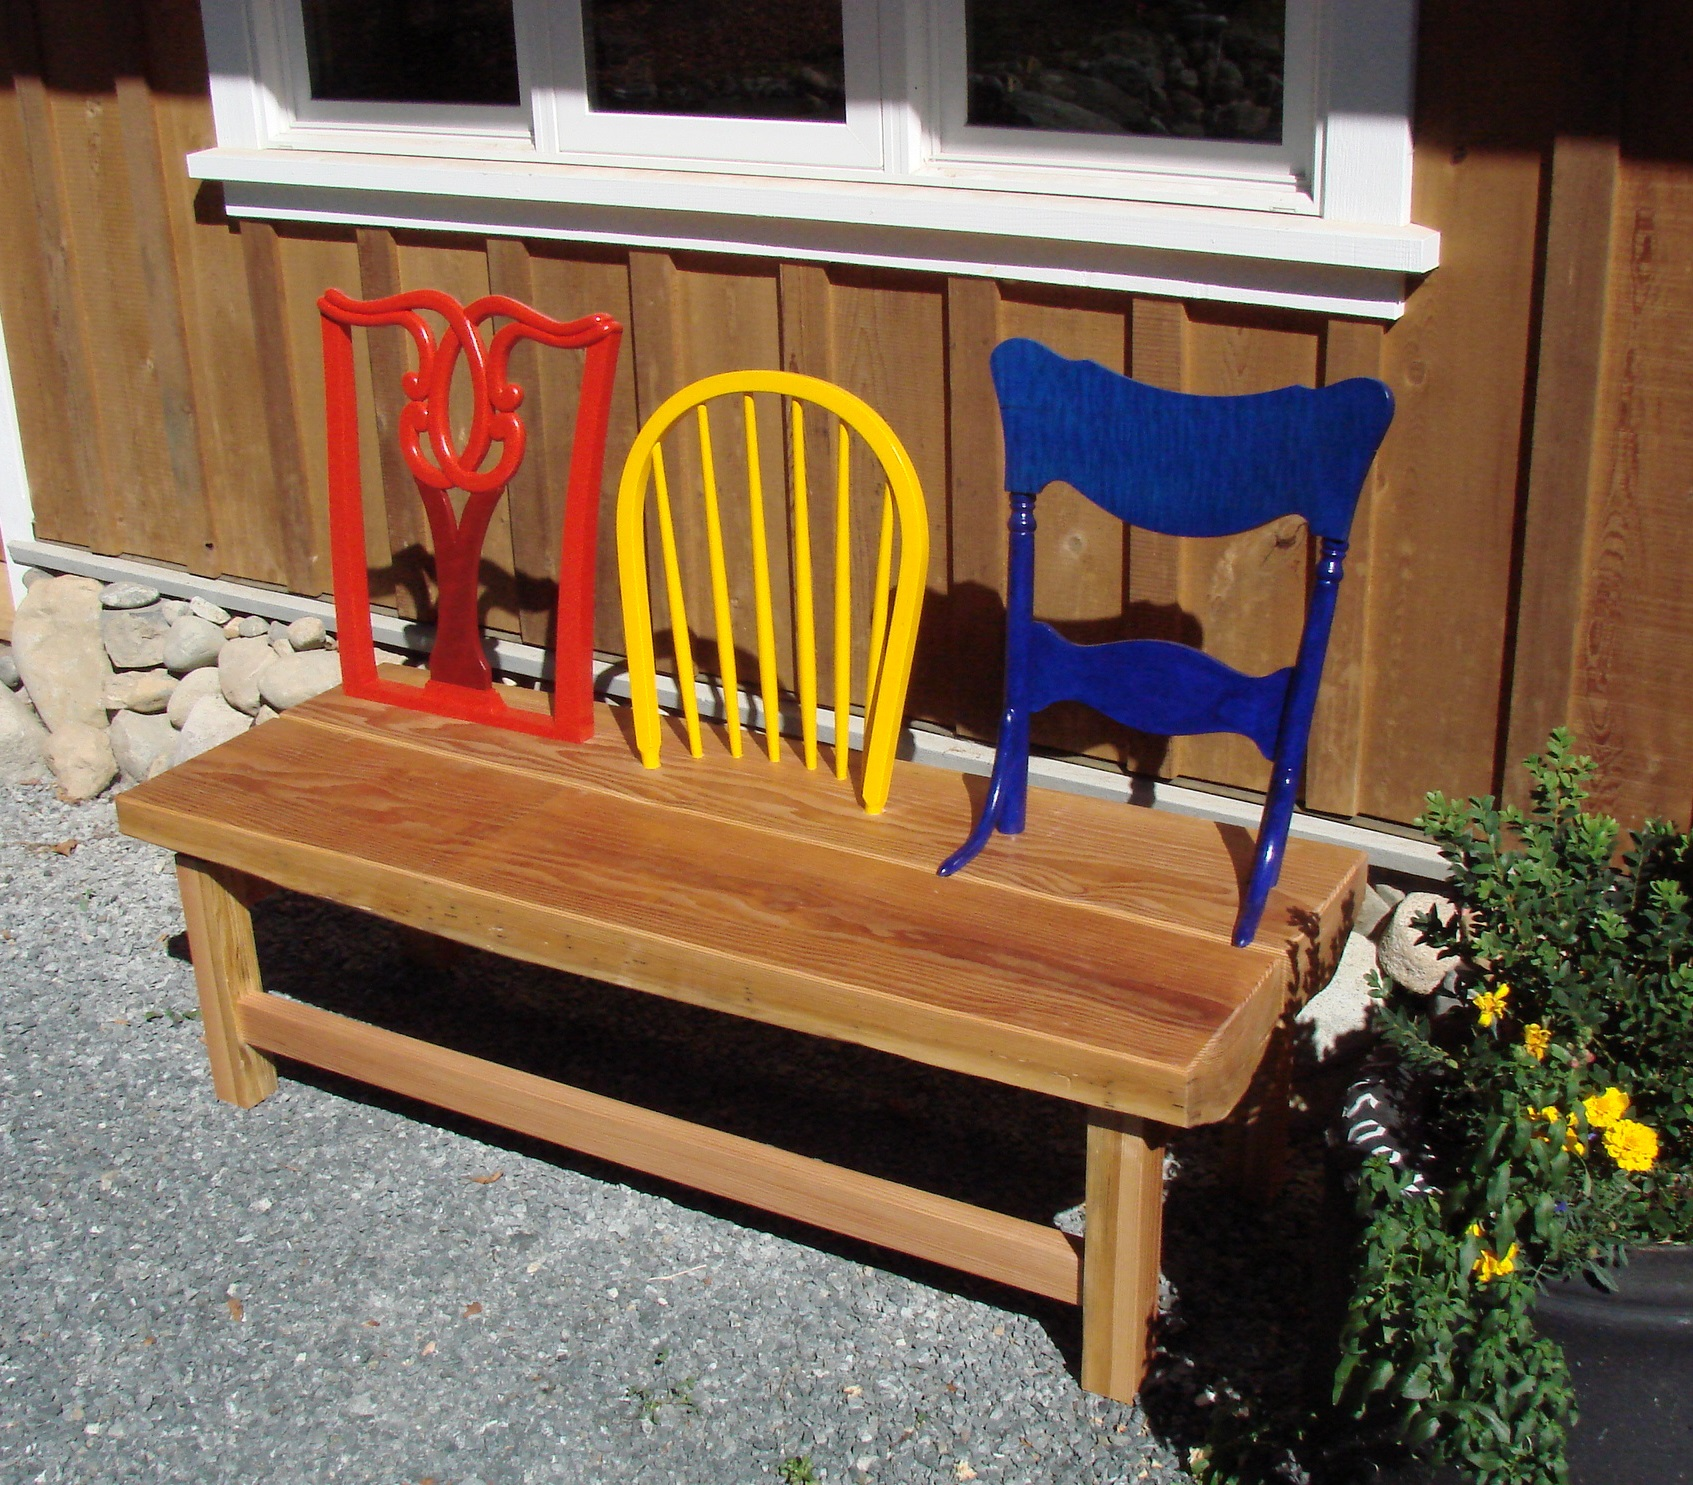 RYB chairback bench.jpg